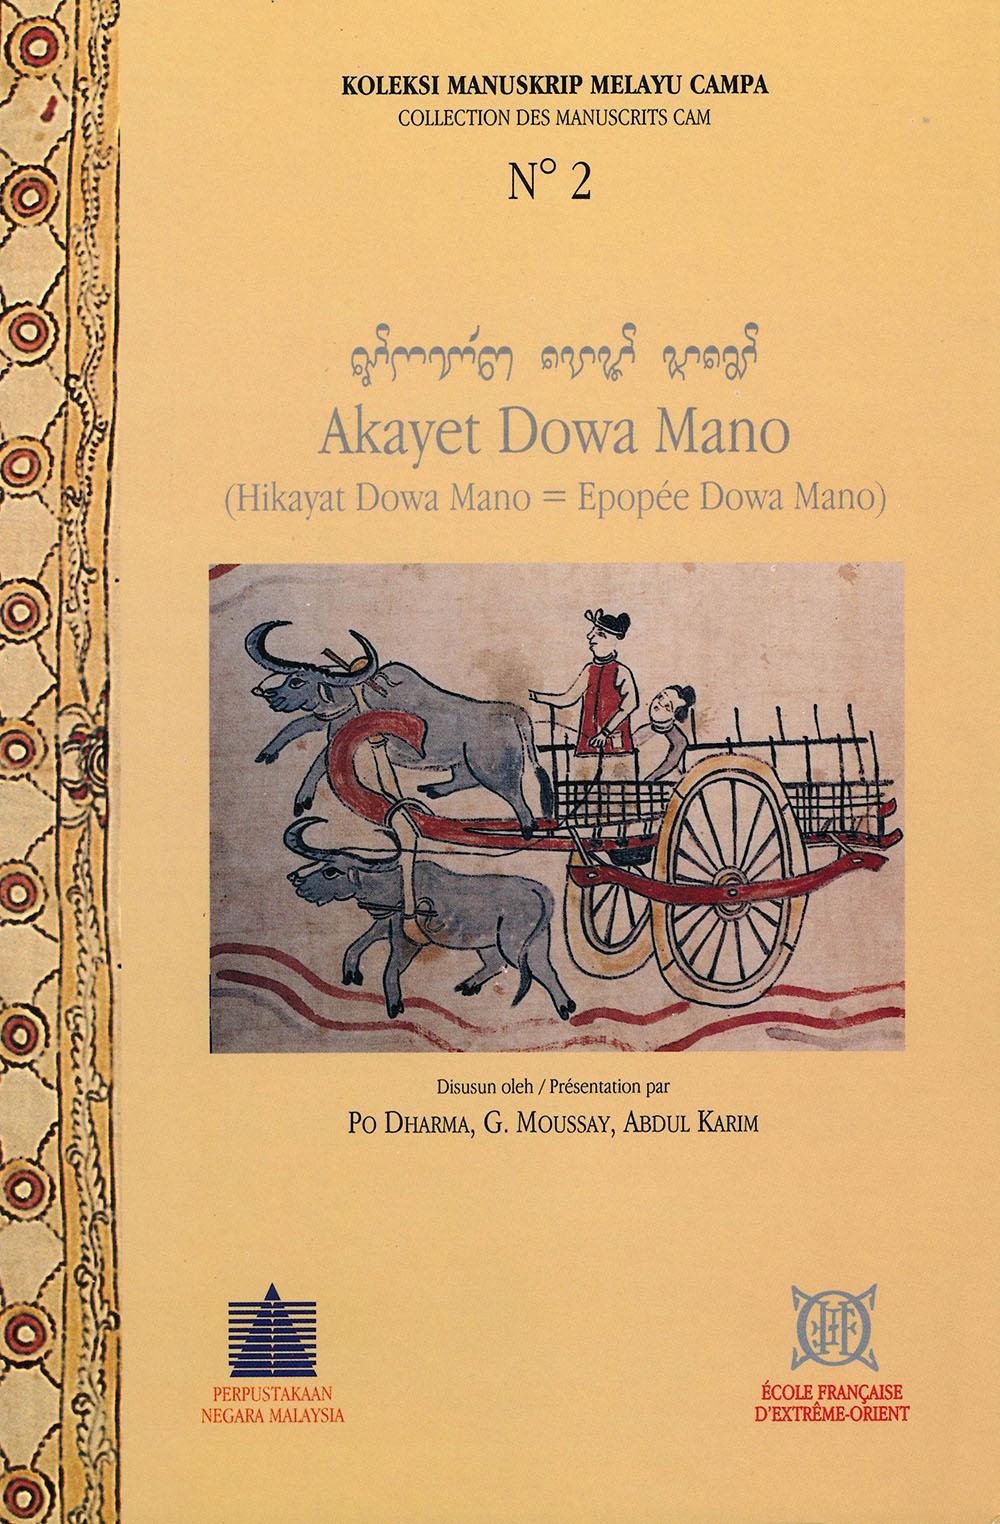 Akayet Dowa Mano [Hikayat Dowa Mano - Épopée Dowa Mano]